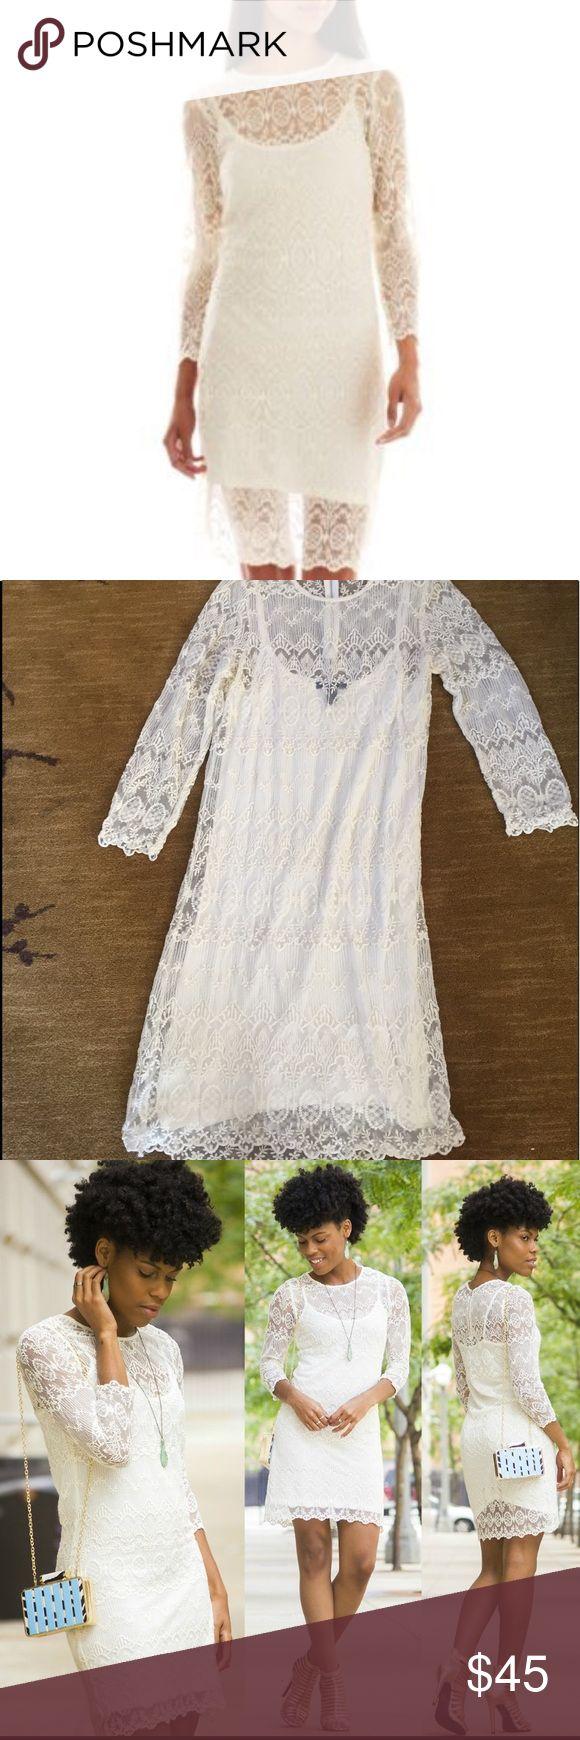 MNG by Mango white lace dress Worn once. Off white. Mango Dresses Long Sleeve